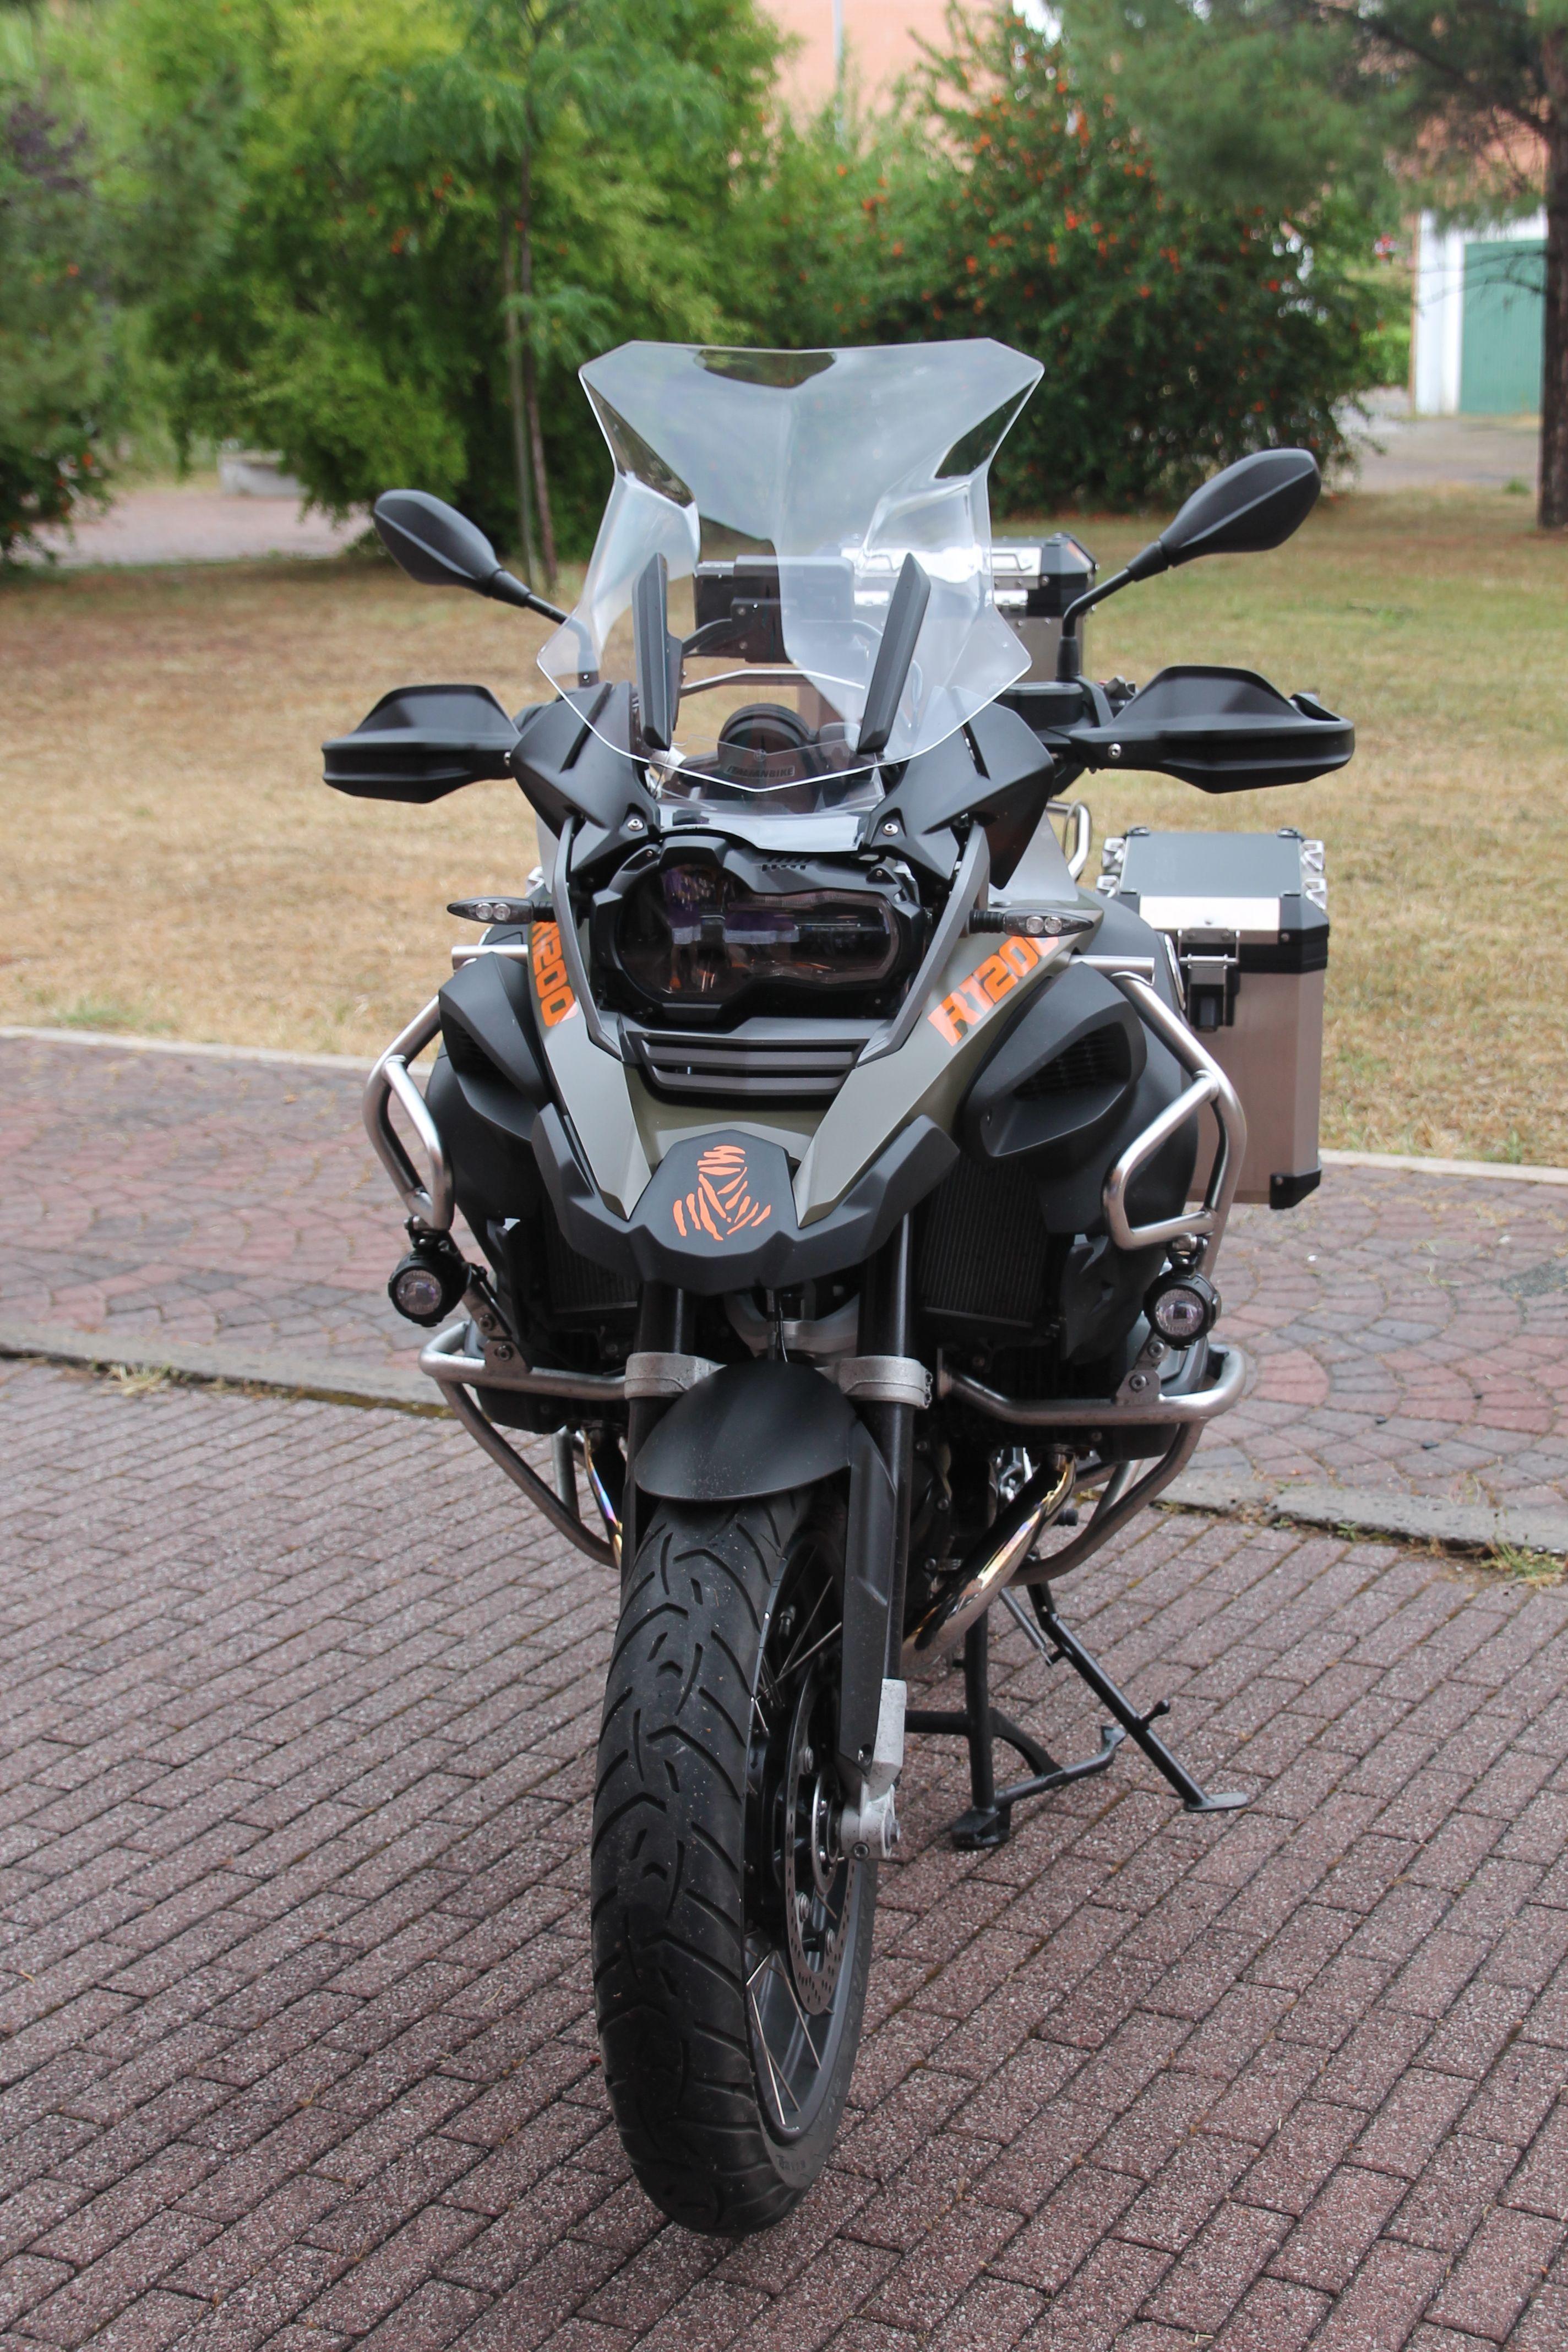 bmw gs1200 2016 Buscar con Google Motorcycle Pinterest